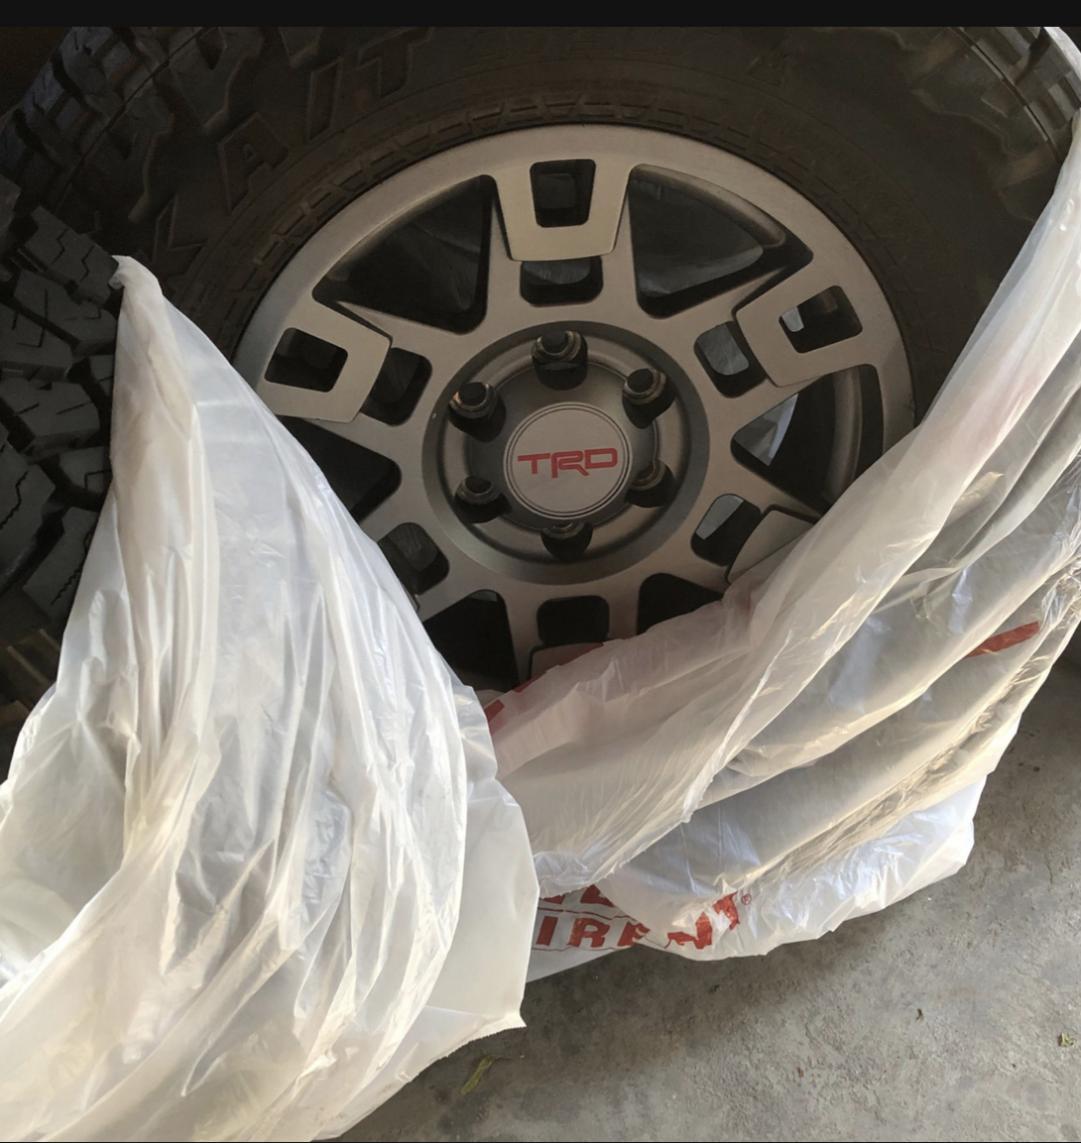 TRD pro Wheels/ Falken Wildpeak AT3275/70/17/ Spider traxx wheel spacers.  SOLD-266b97d5-09c2-4f16-bc59-d51ec1bbabe2-jpg